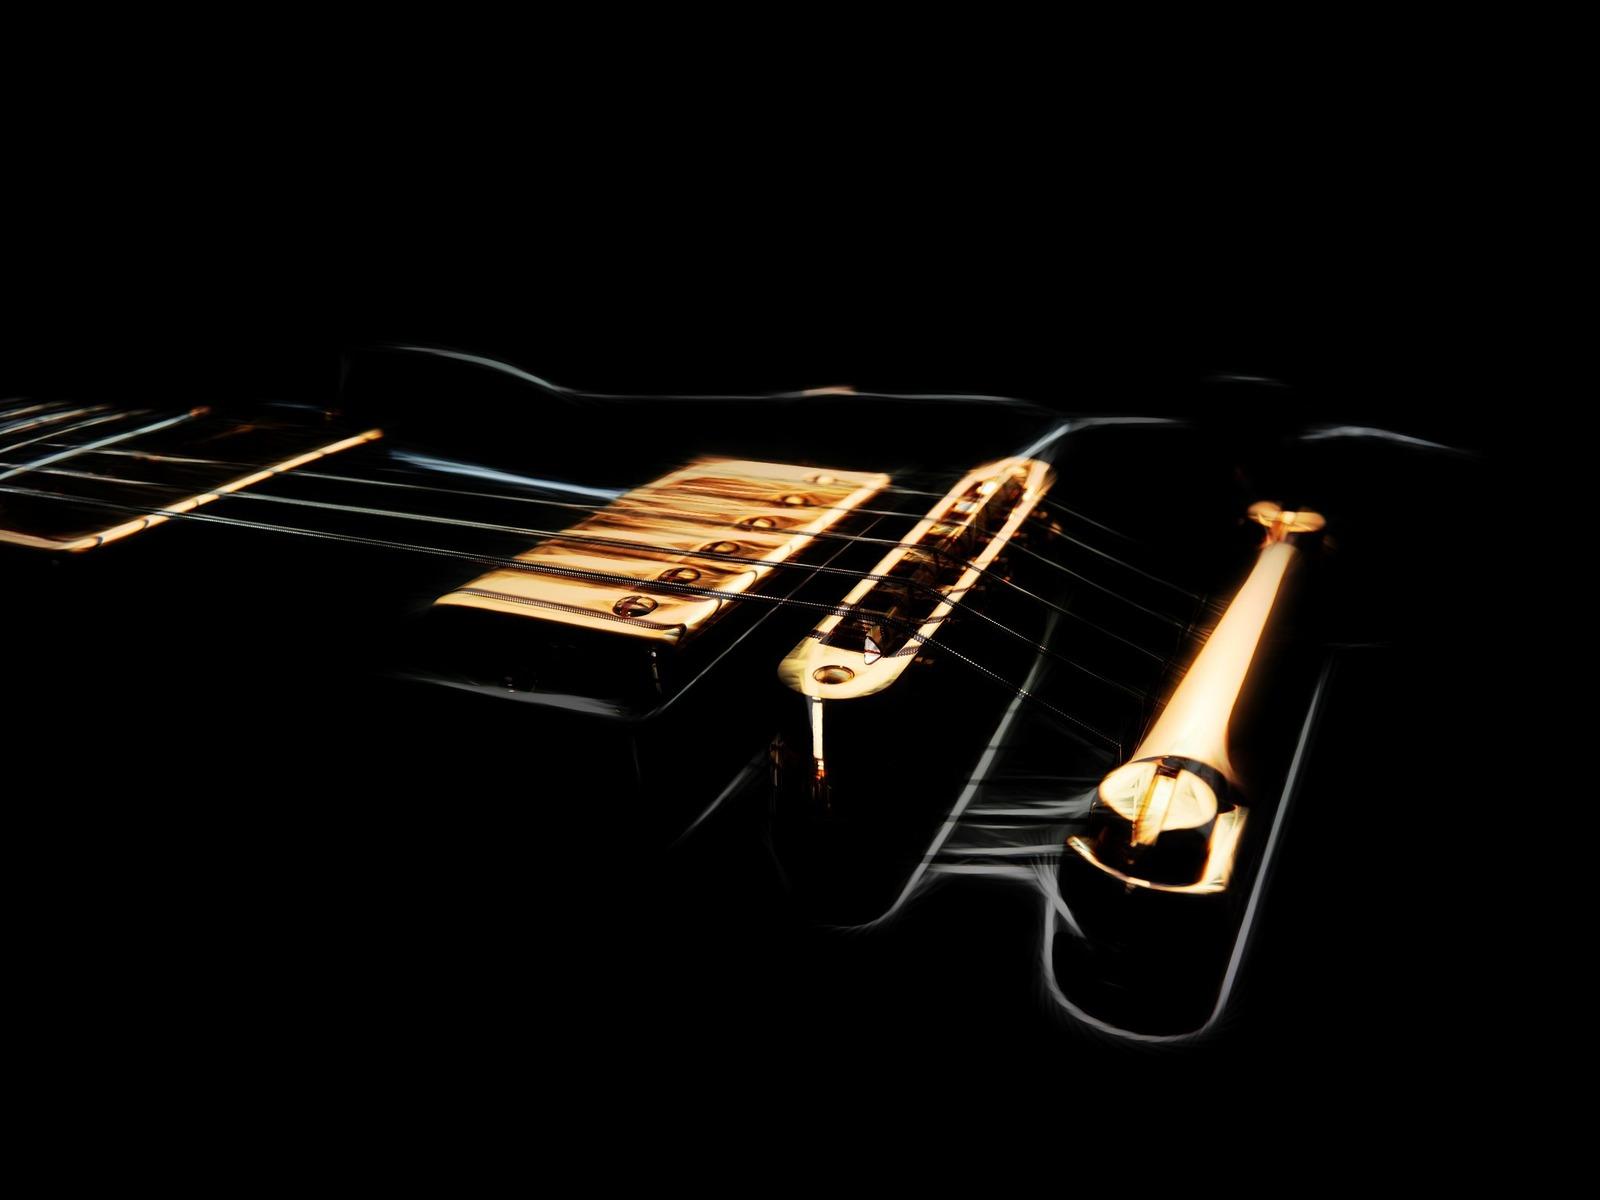 Bass Guitar Wallpapers For Desktop 3881 Hd Wallpapers in Music 1600x1200